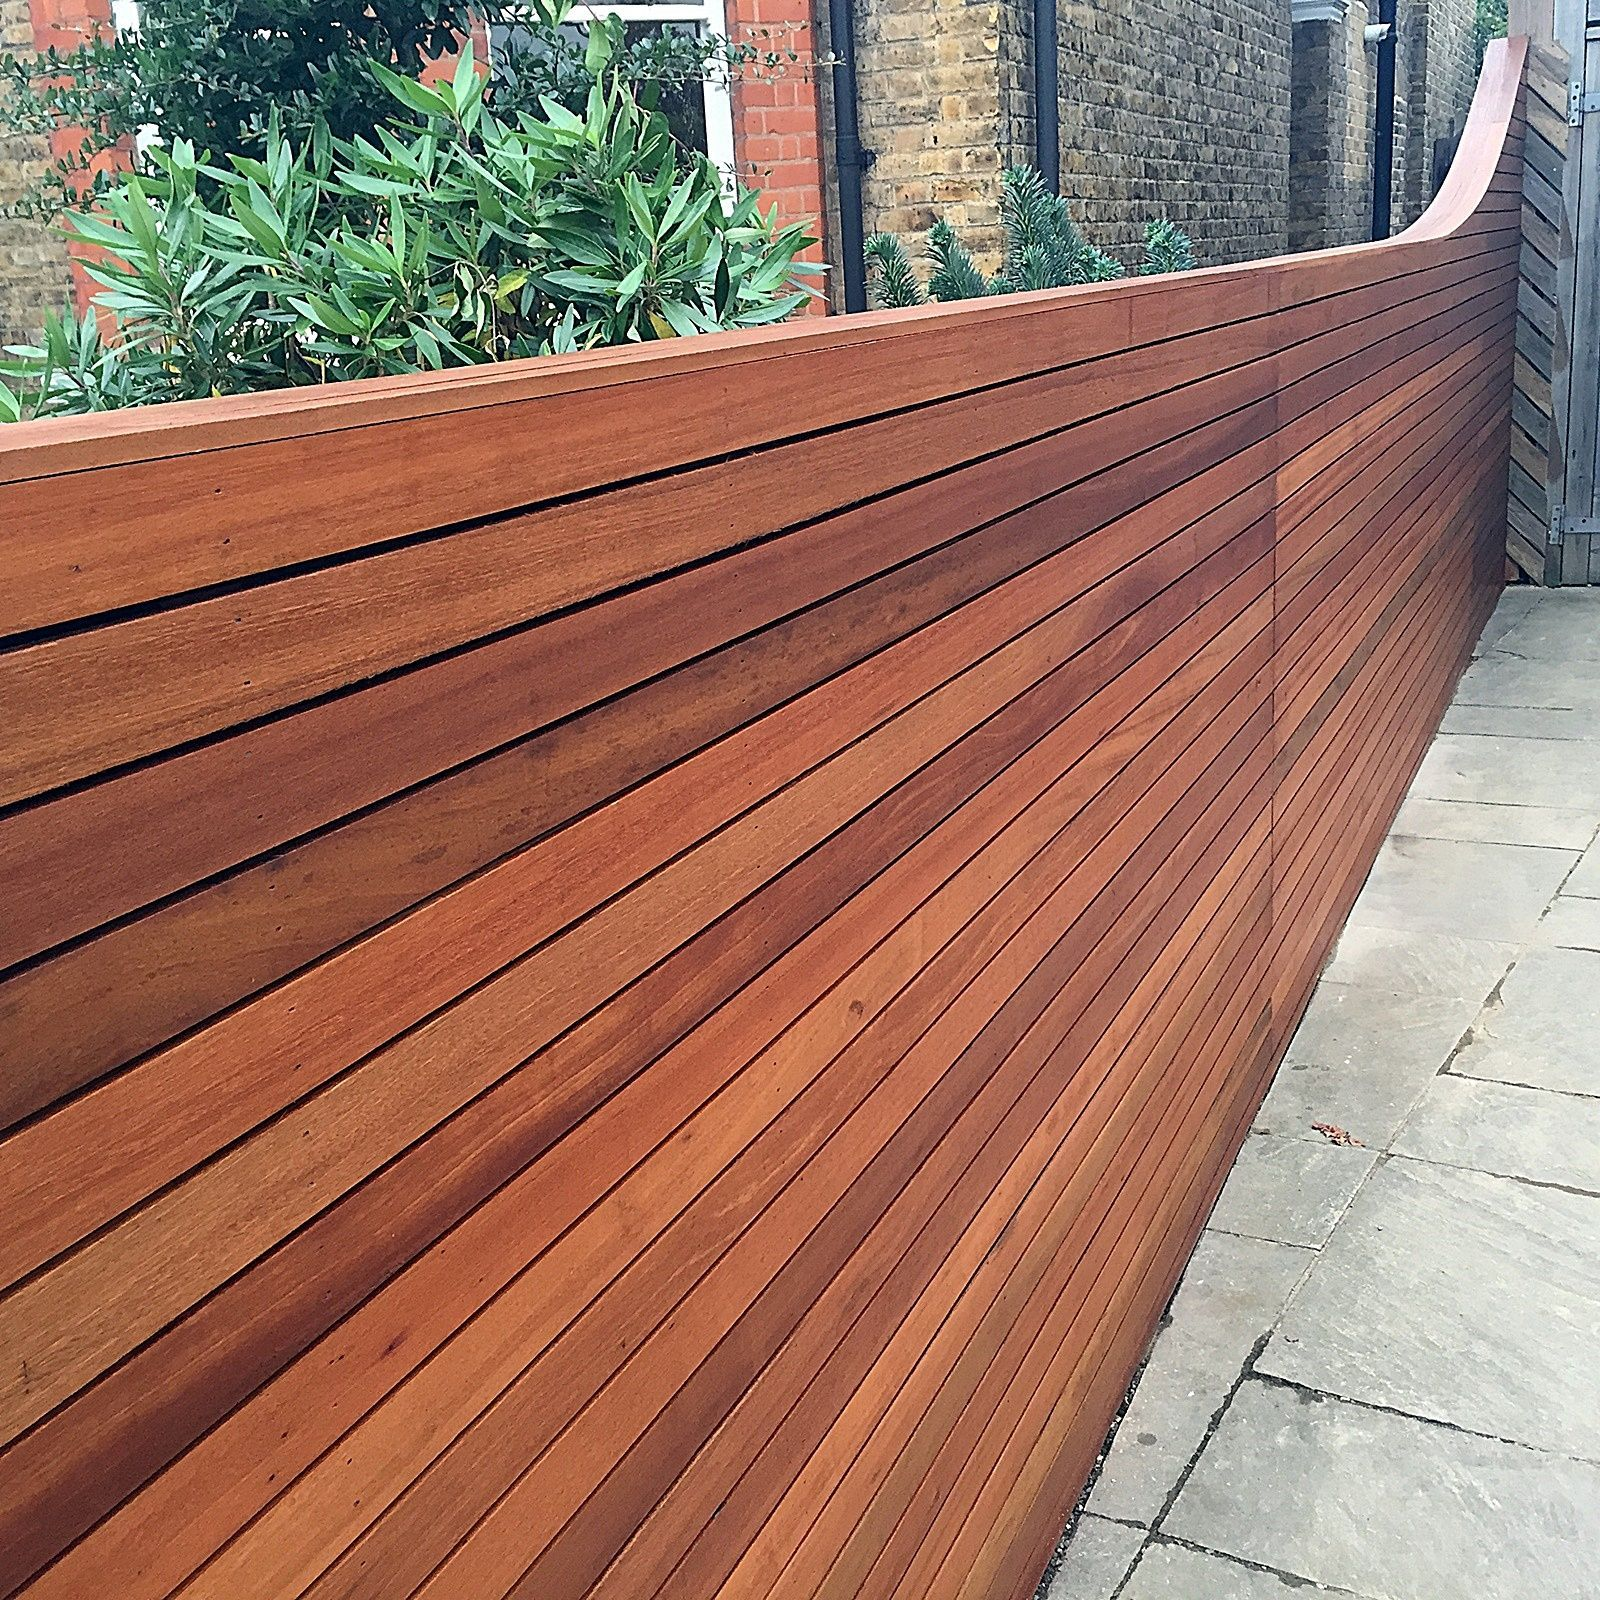 Horizontal Wood Fence Design Benefits Design Material Options More Wood Fence Design Wood Trellis Fence Design